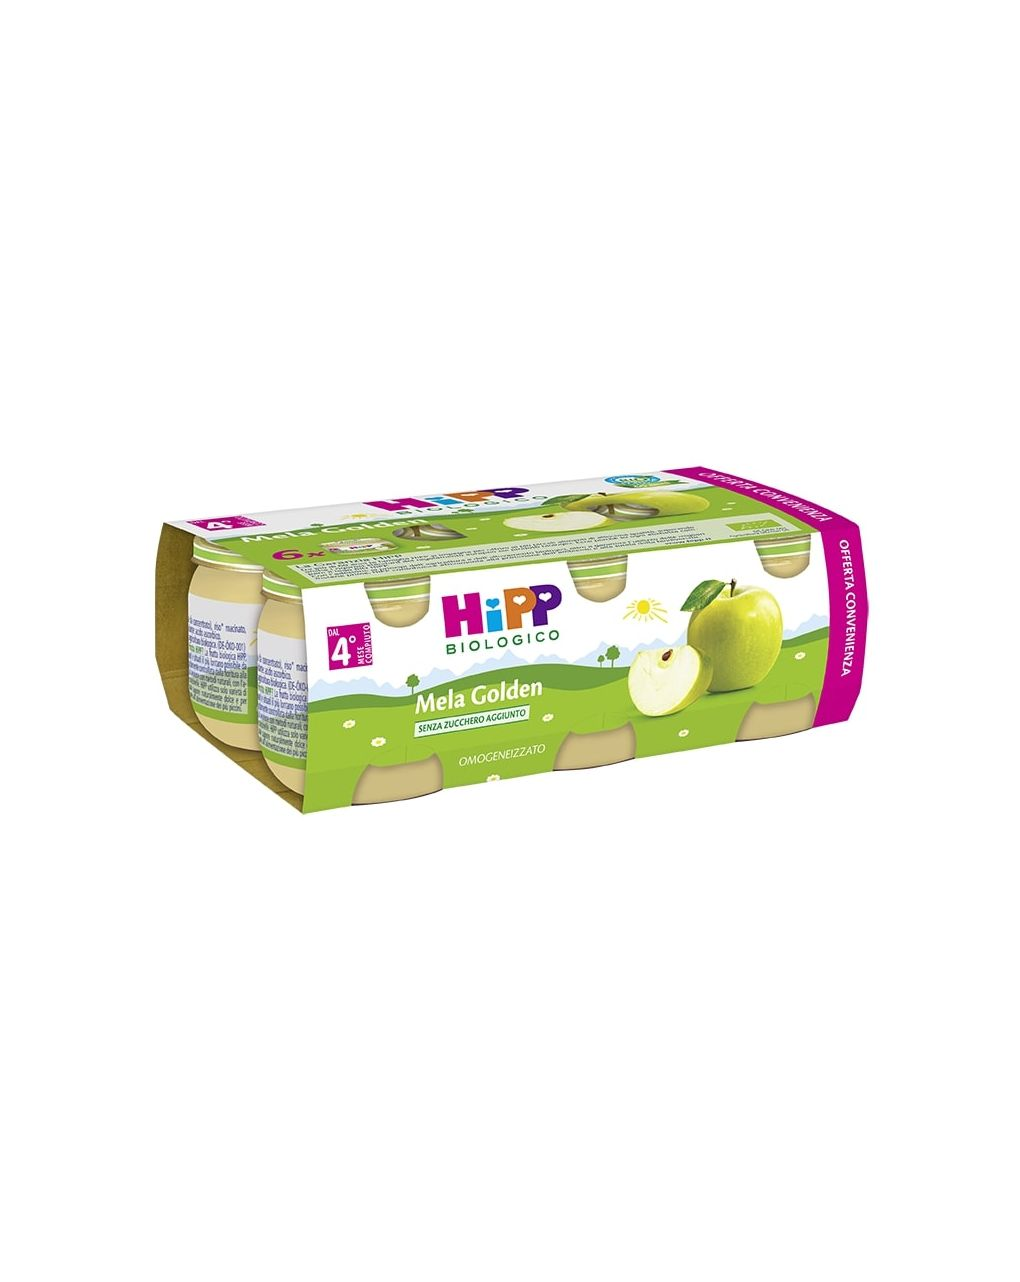 Hipp - omogeneizzato mela golden 100% 6x80g - Hipp